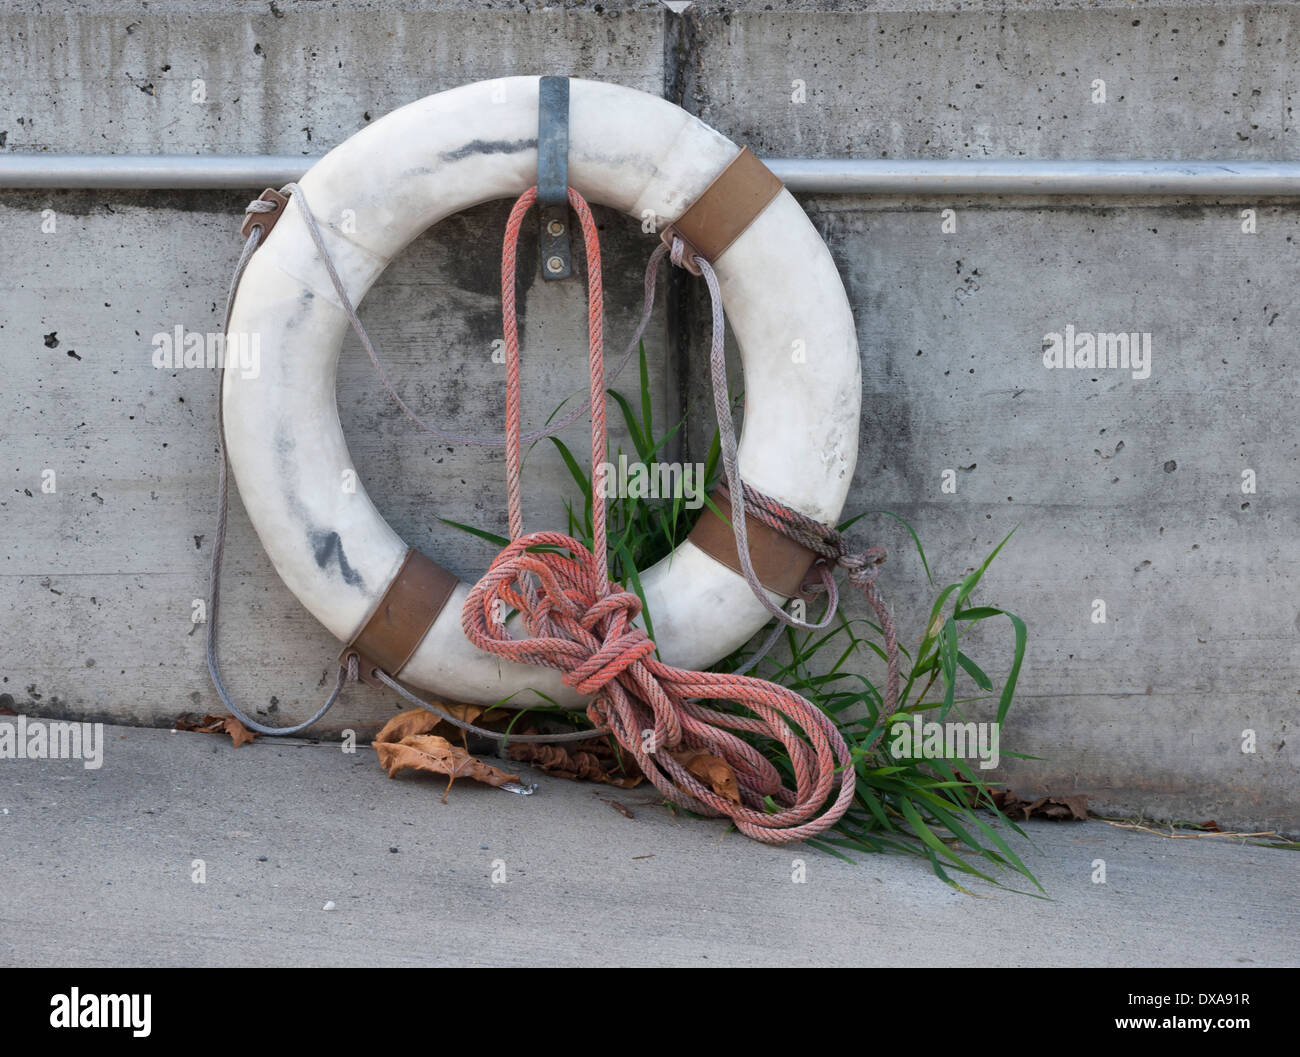 Old, roten life-saver - Stock Image